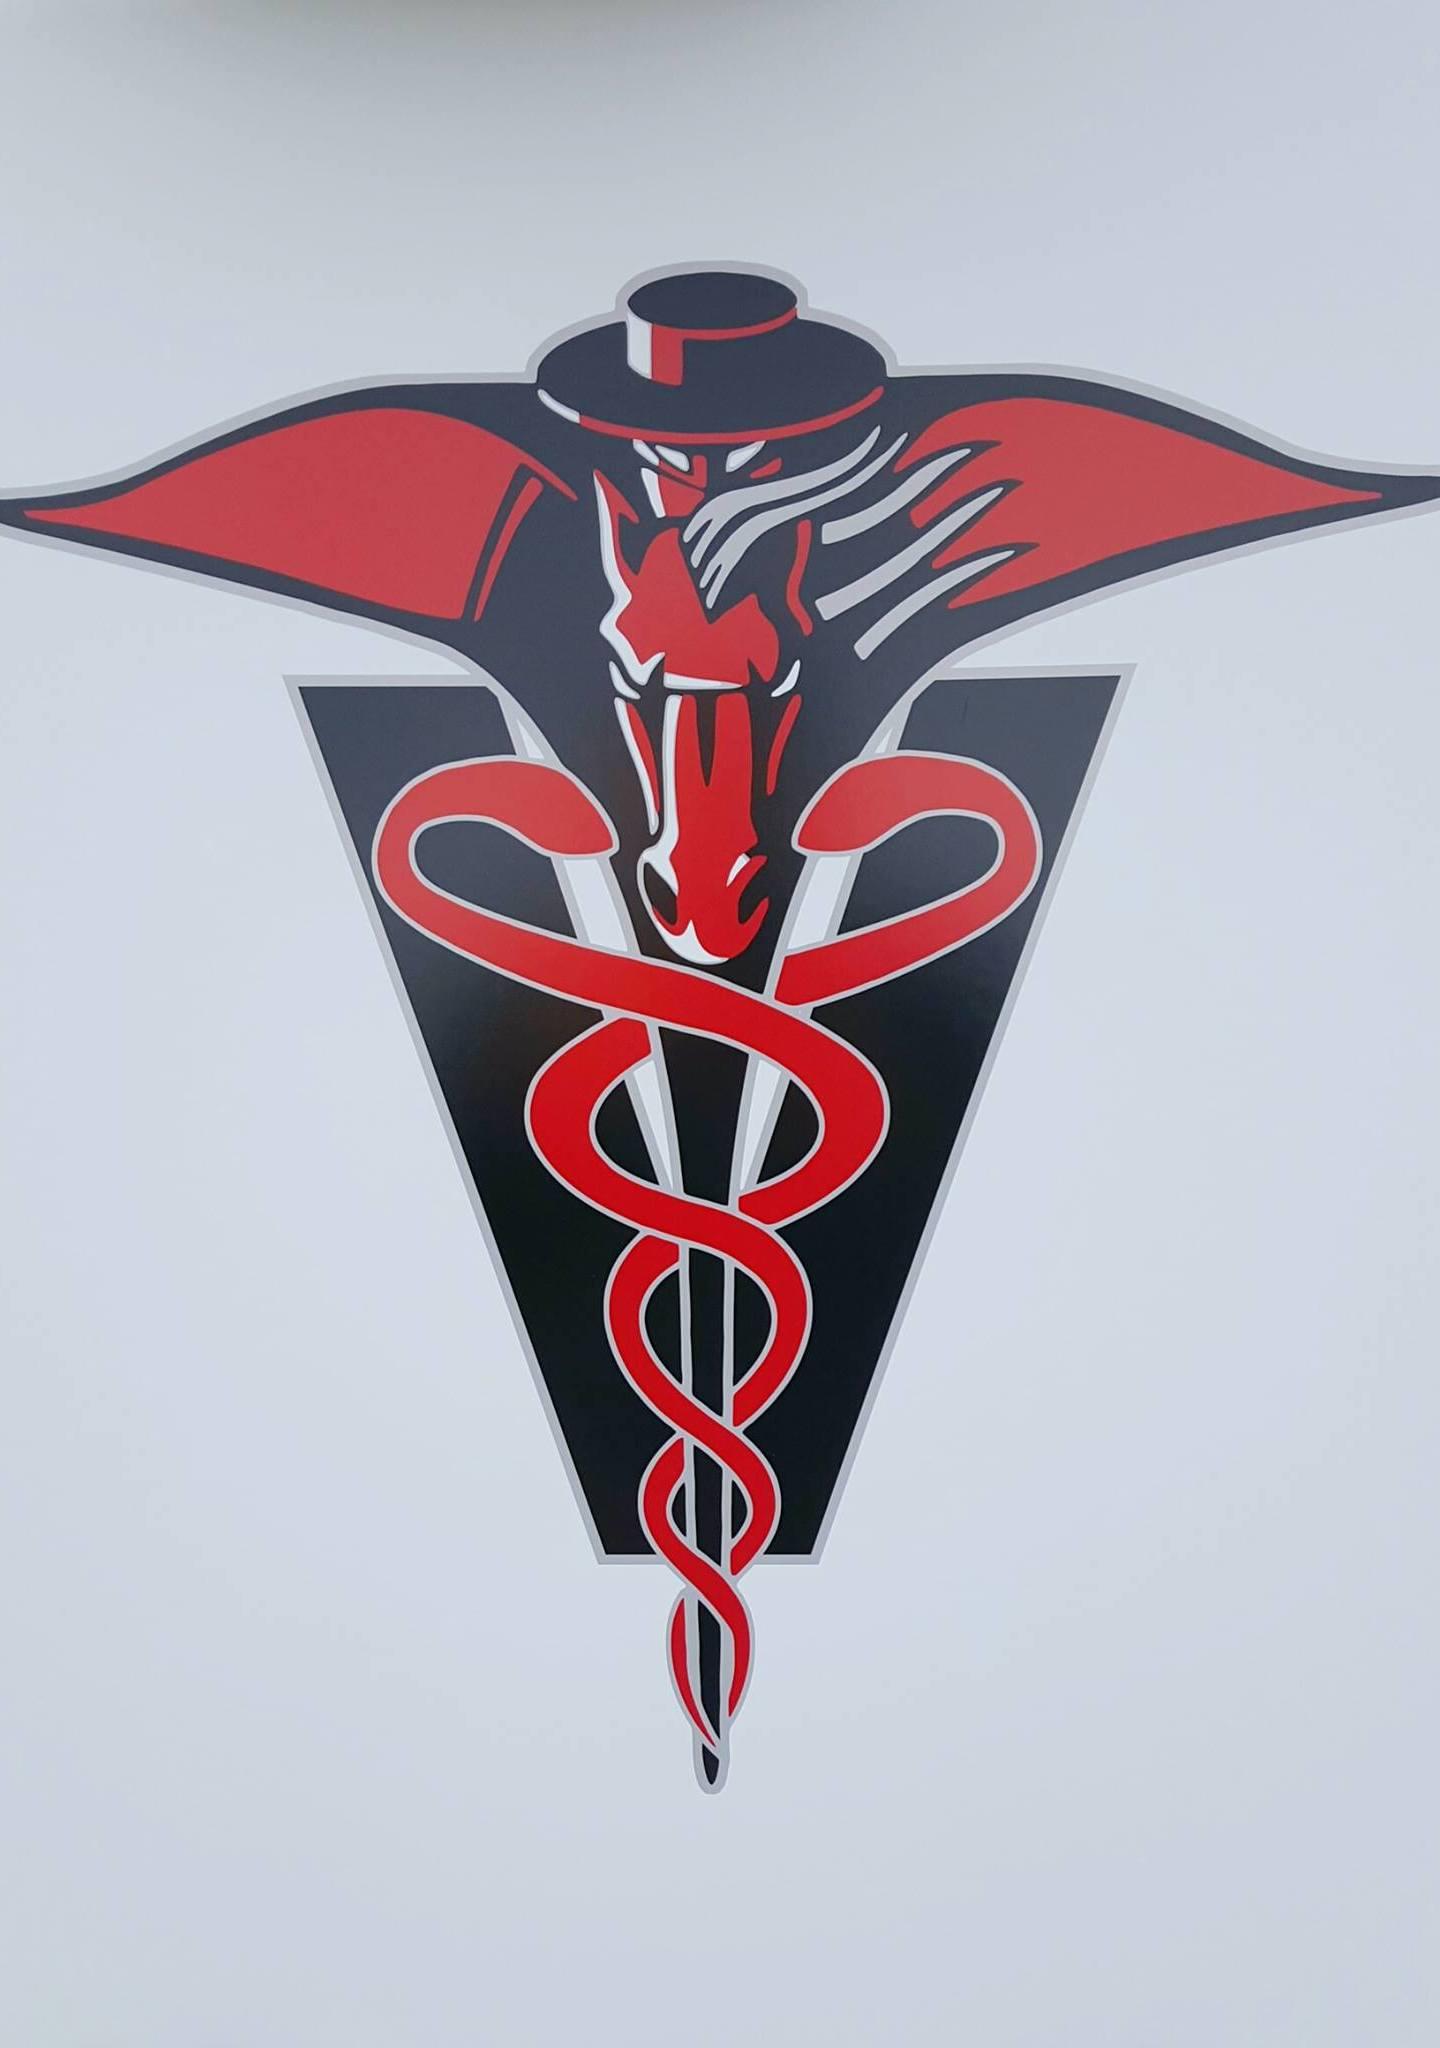 Texas Tech Vet School Logo Vertical_1495939635301.jpg